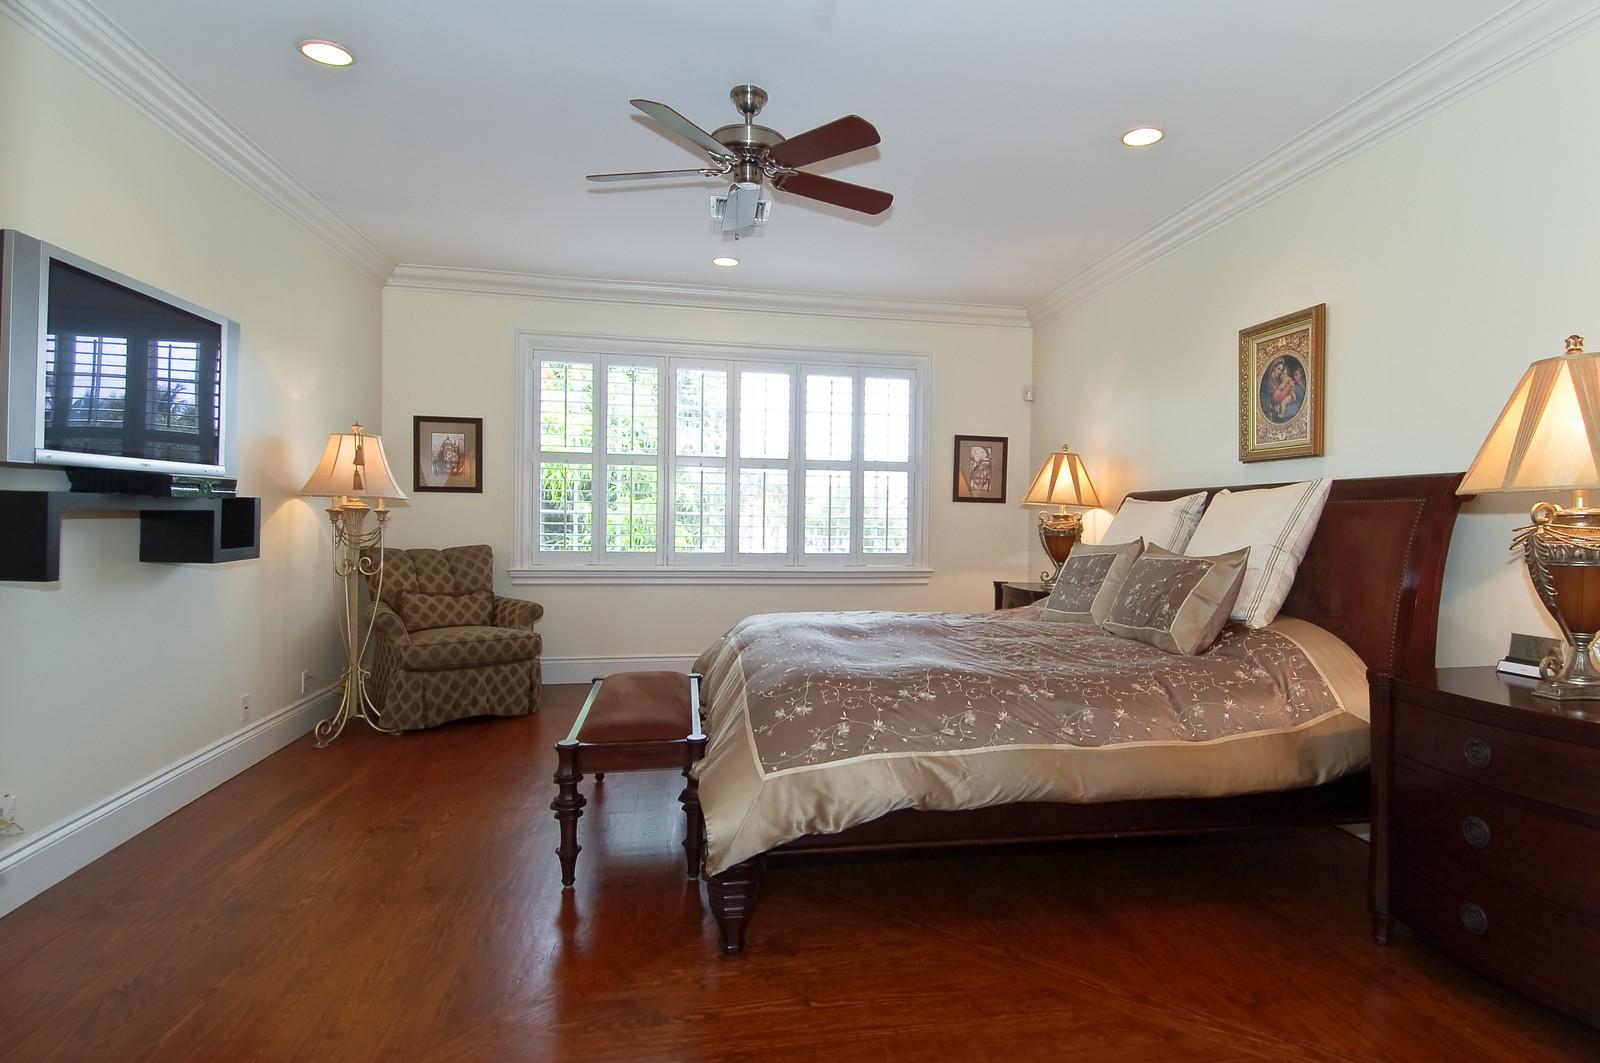 Real Estate Photography - 355 NE 3rd Ct, Boca Raton, FL, 33432 - Master Bedroom